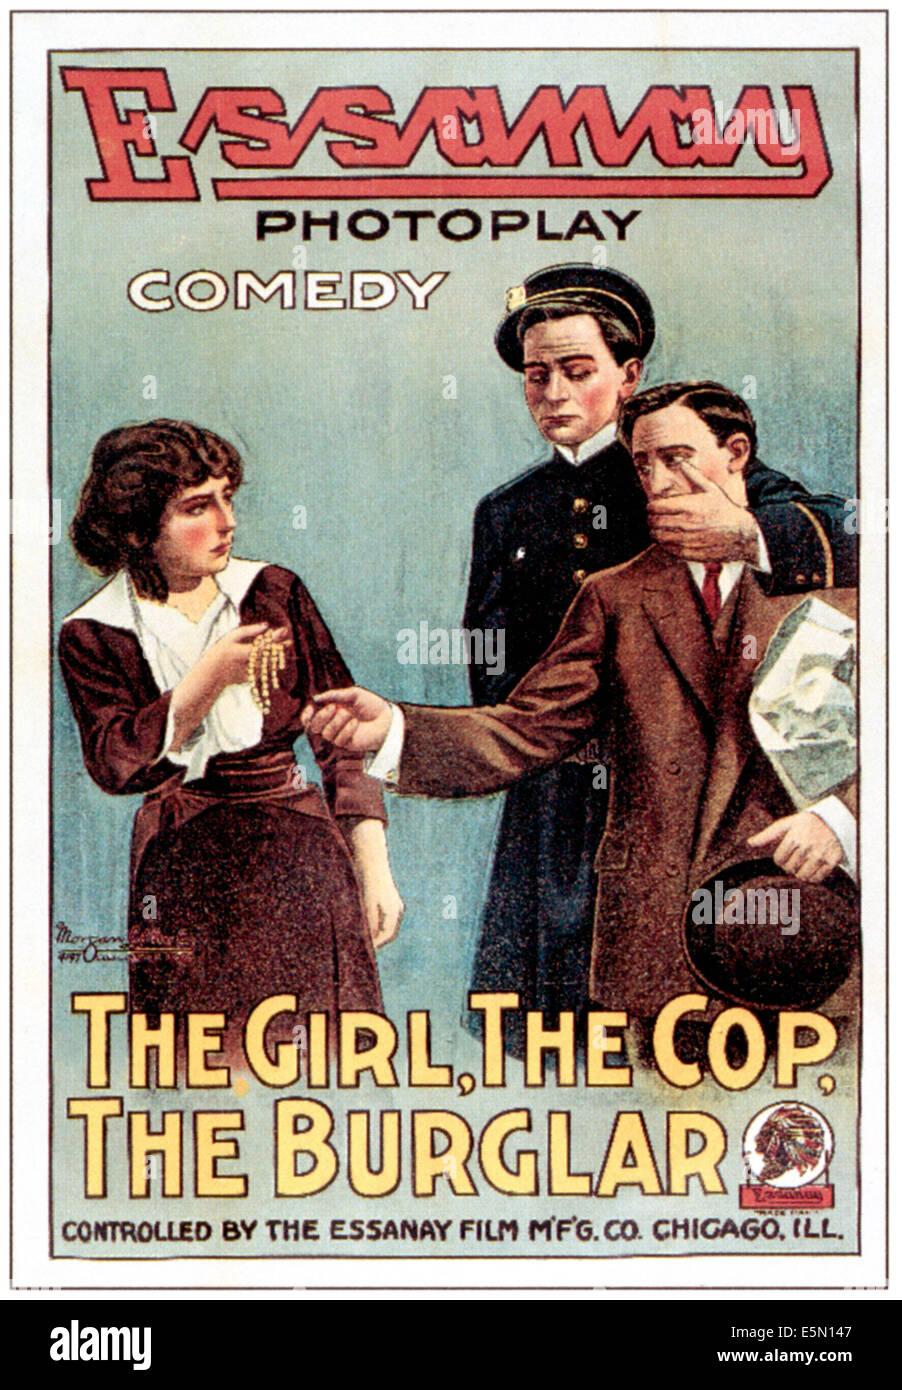 THE GIRL, THE COP, THE BURGLAR, 1914 - Stock Image